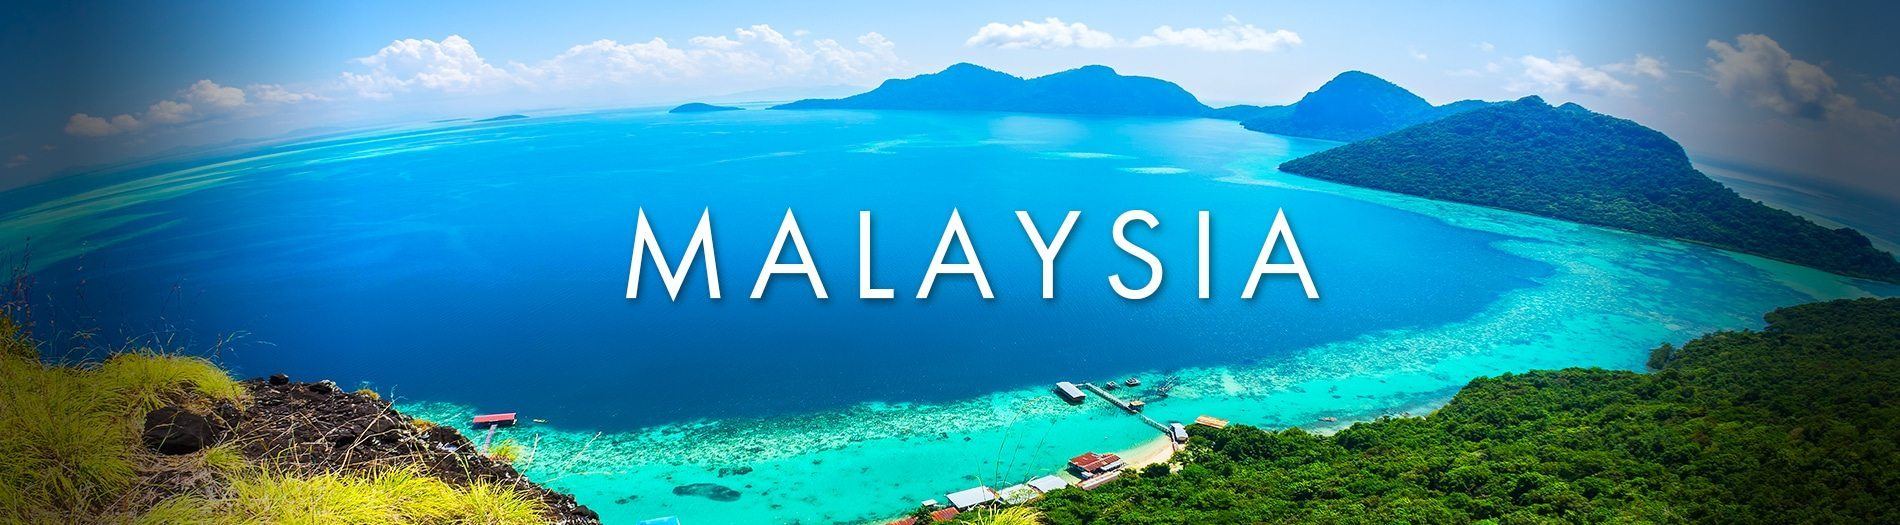 Honeymoon Offer in Malaysia 1000 $